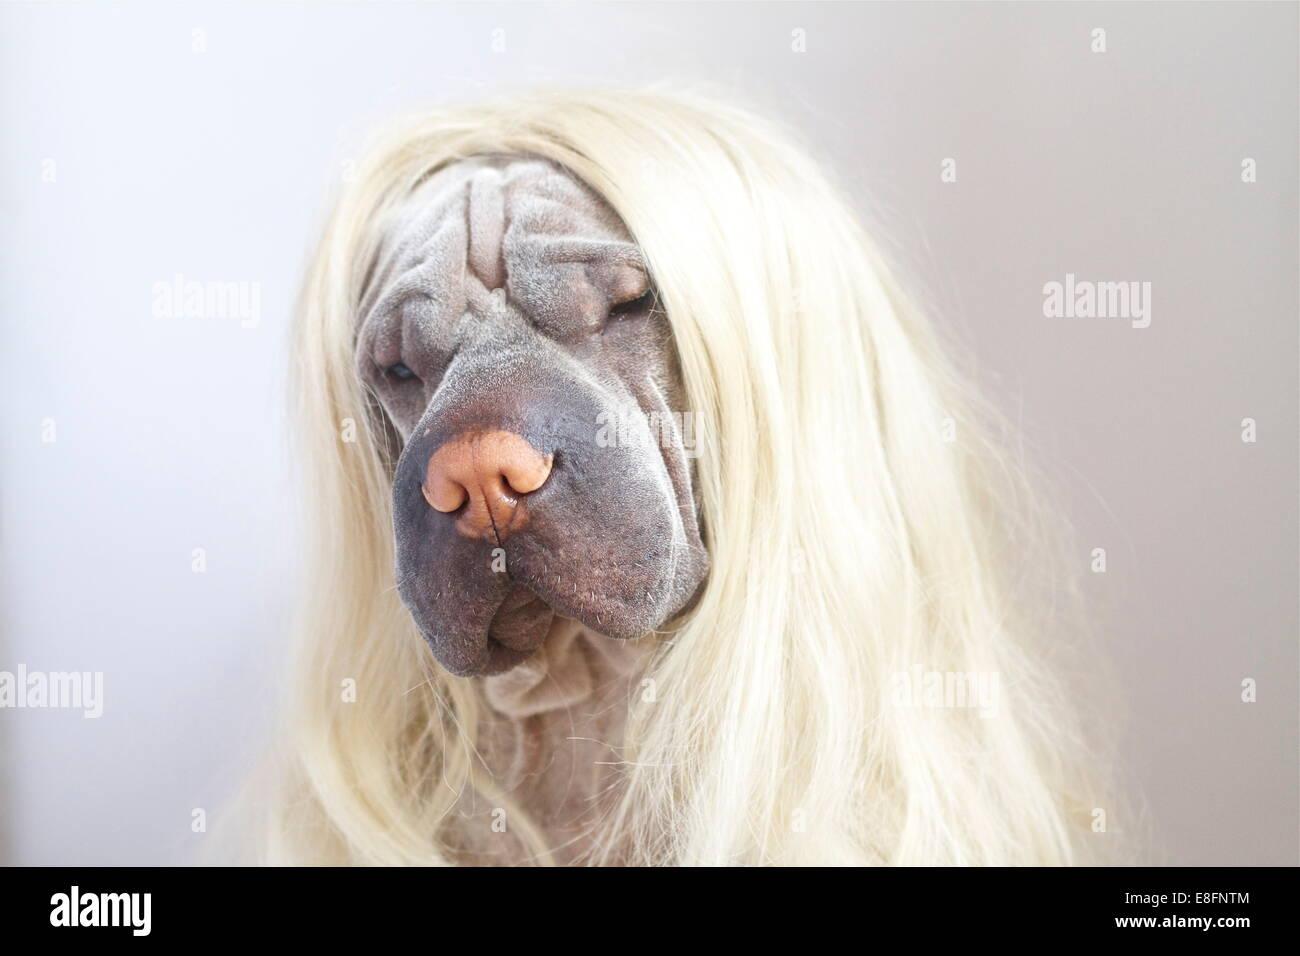 Shar pei perro con una larga peluca rubia Foto de stock